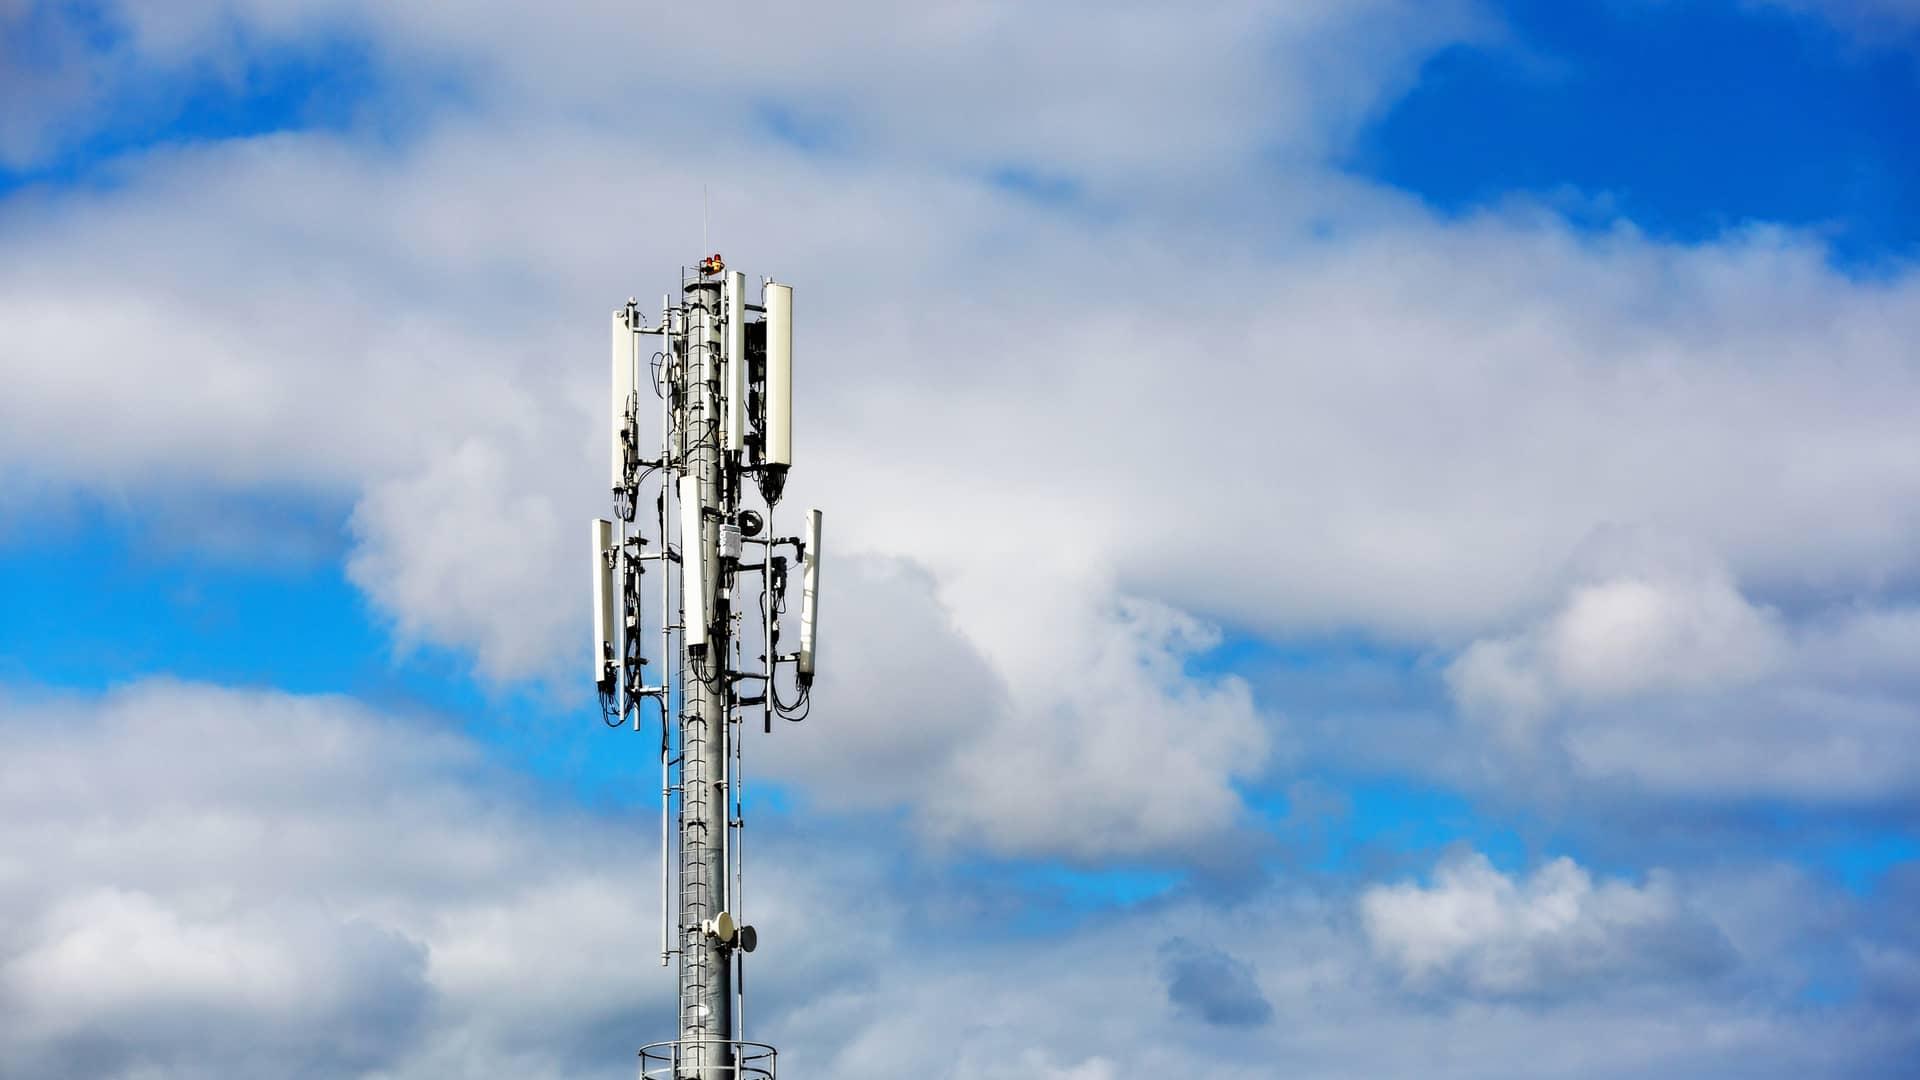 Antena telefónica representa cobertura euskaltel